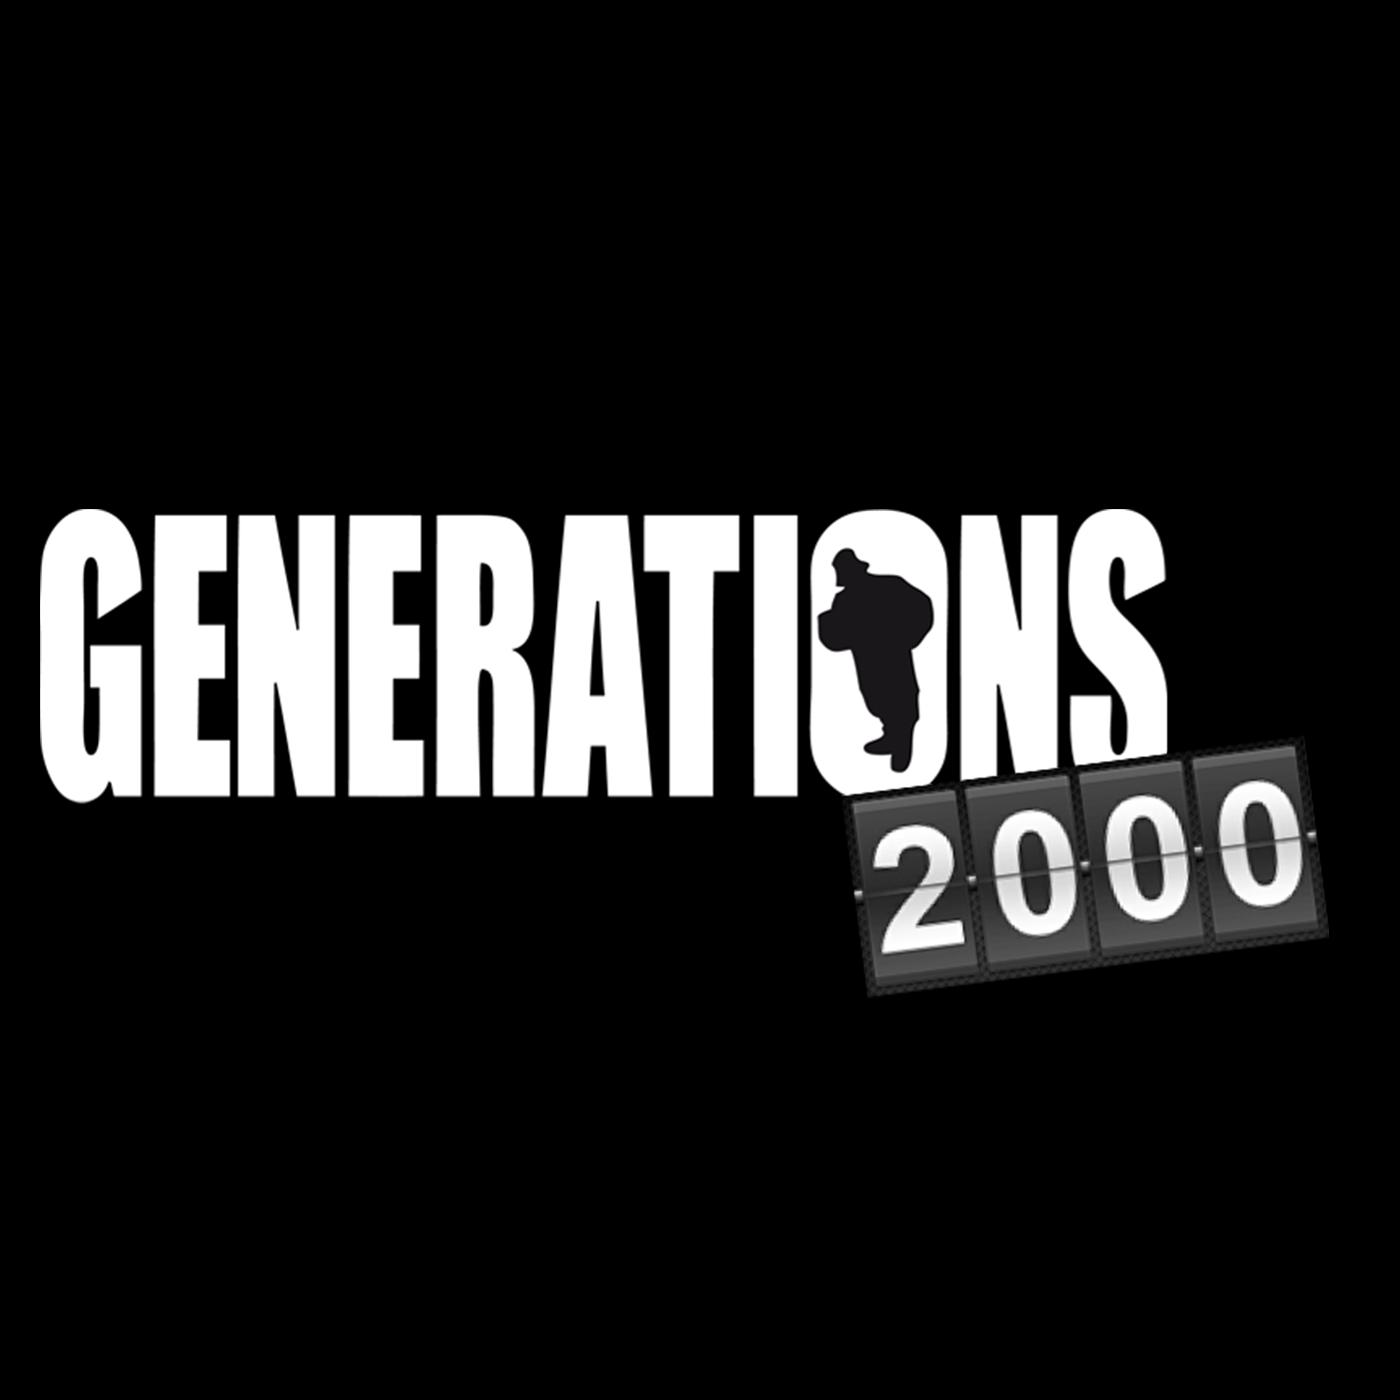 Generations - 2000